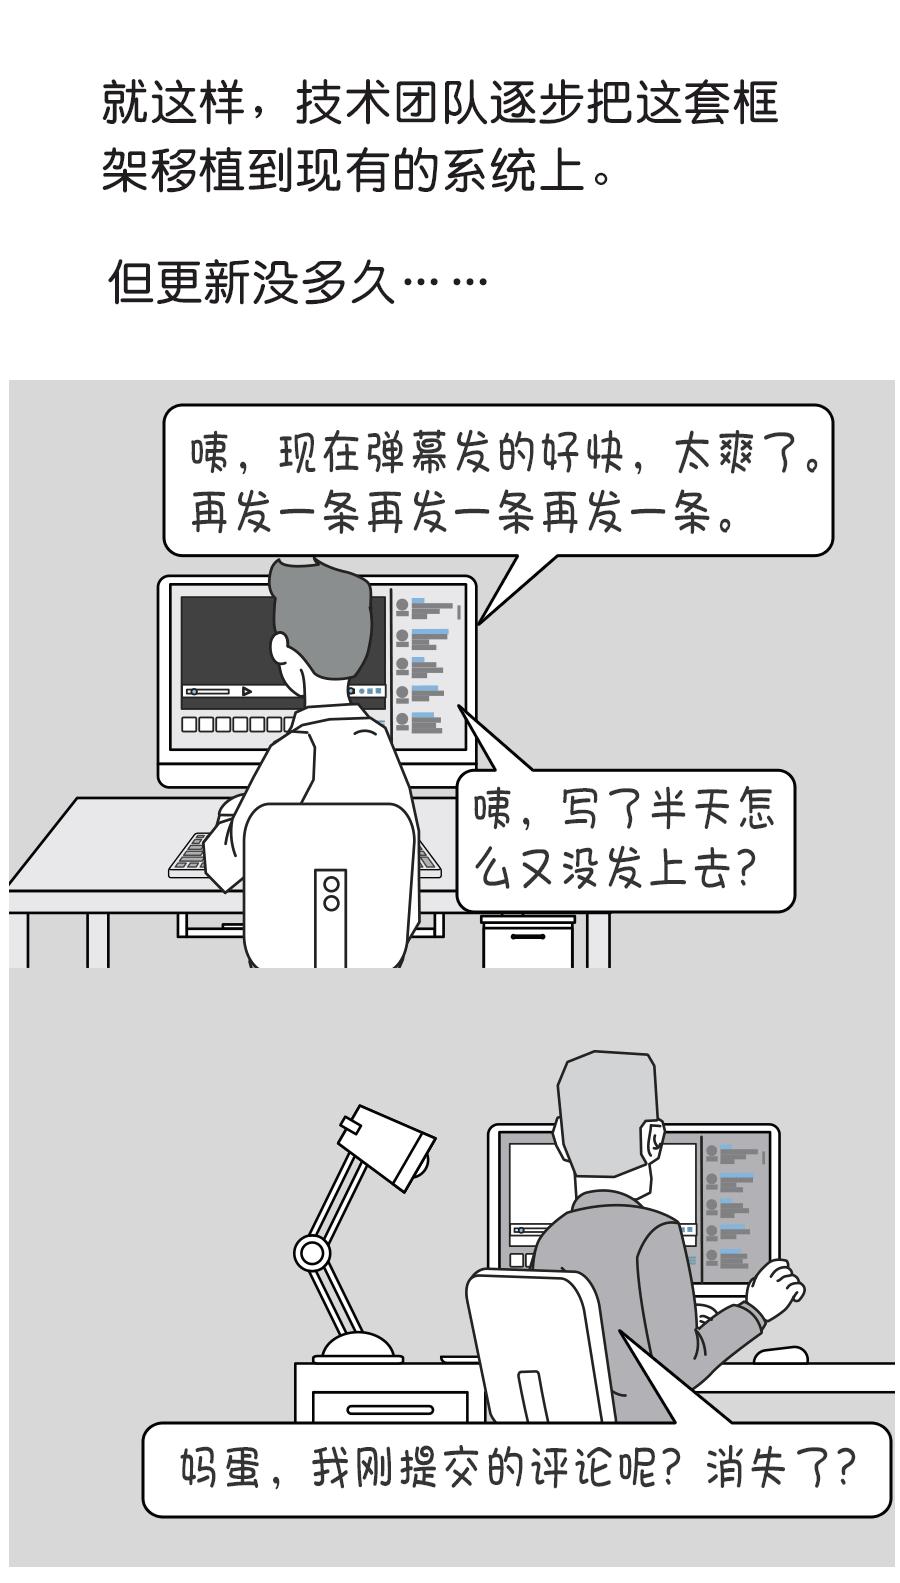 qiniu_09_25